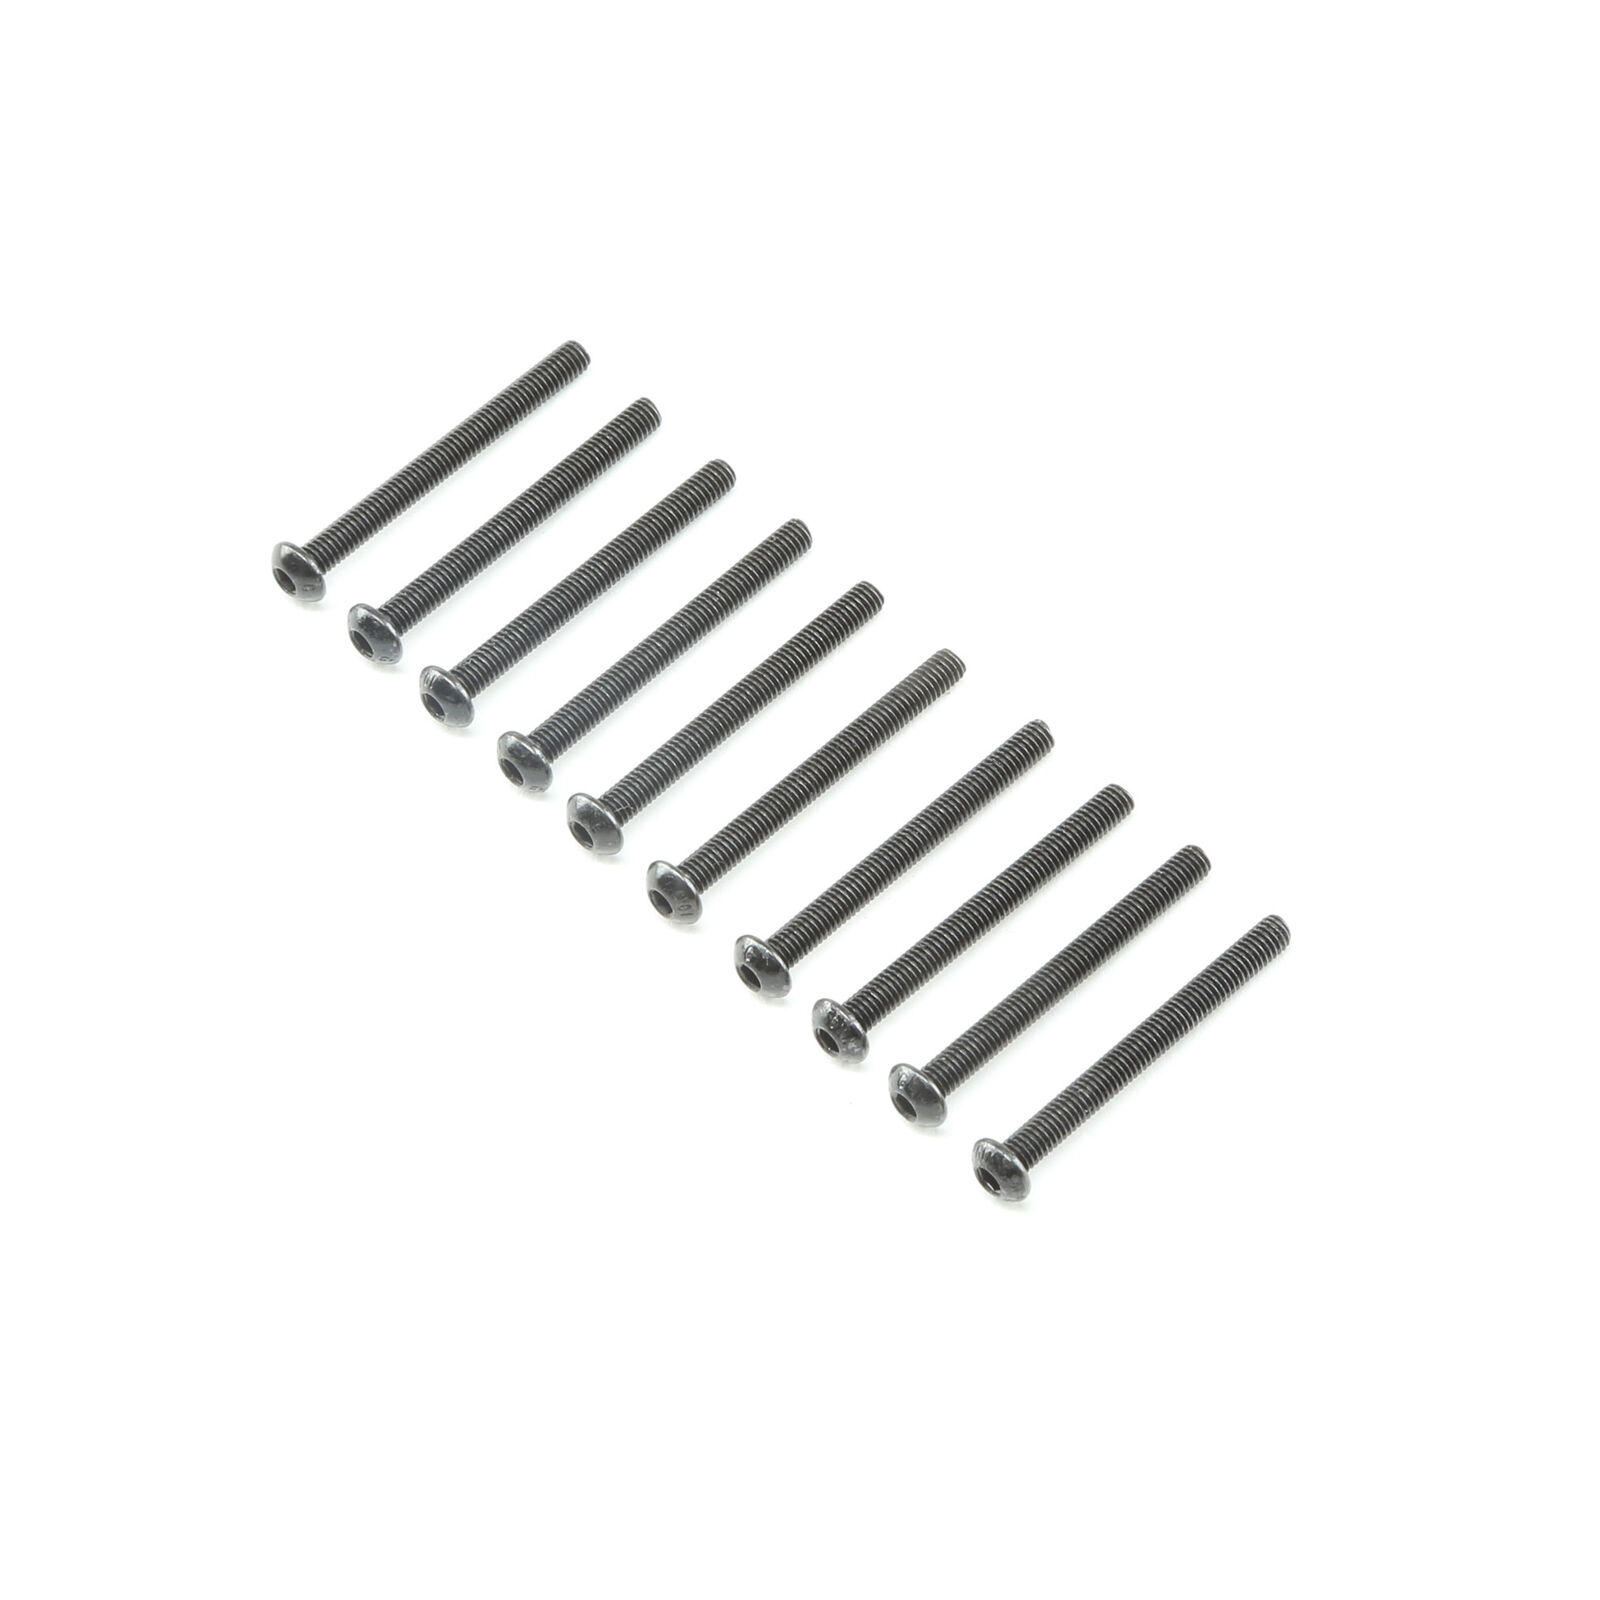 Button Head Screws M3x30mm (10)